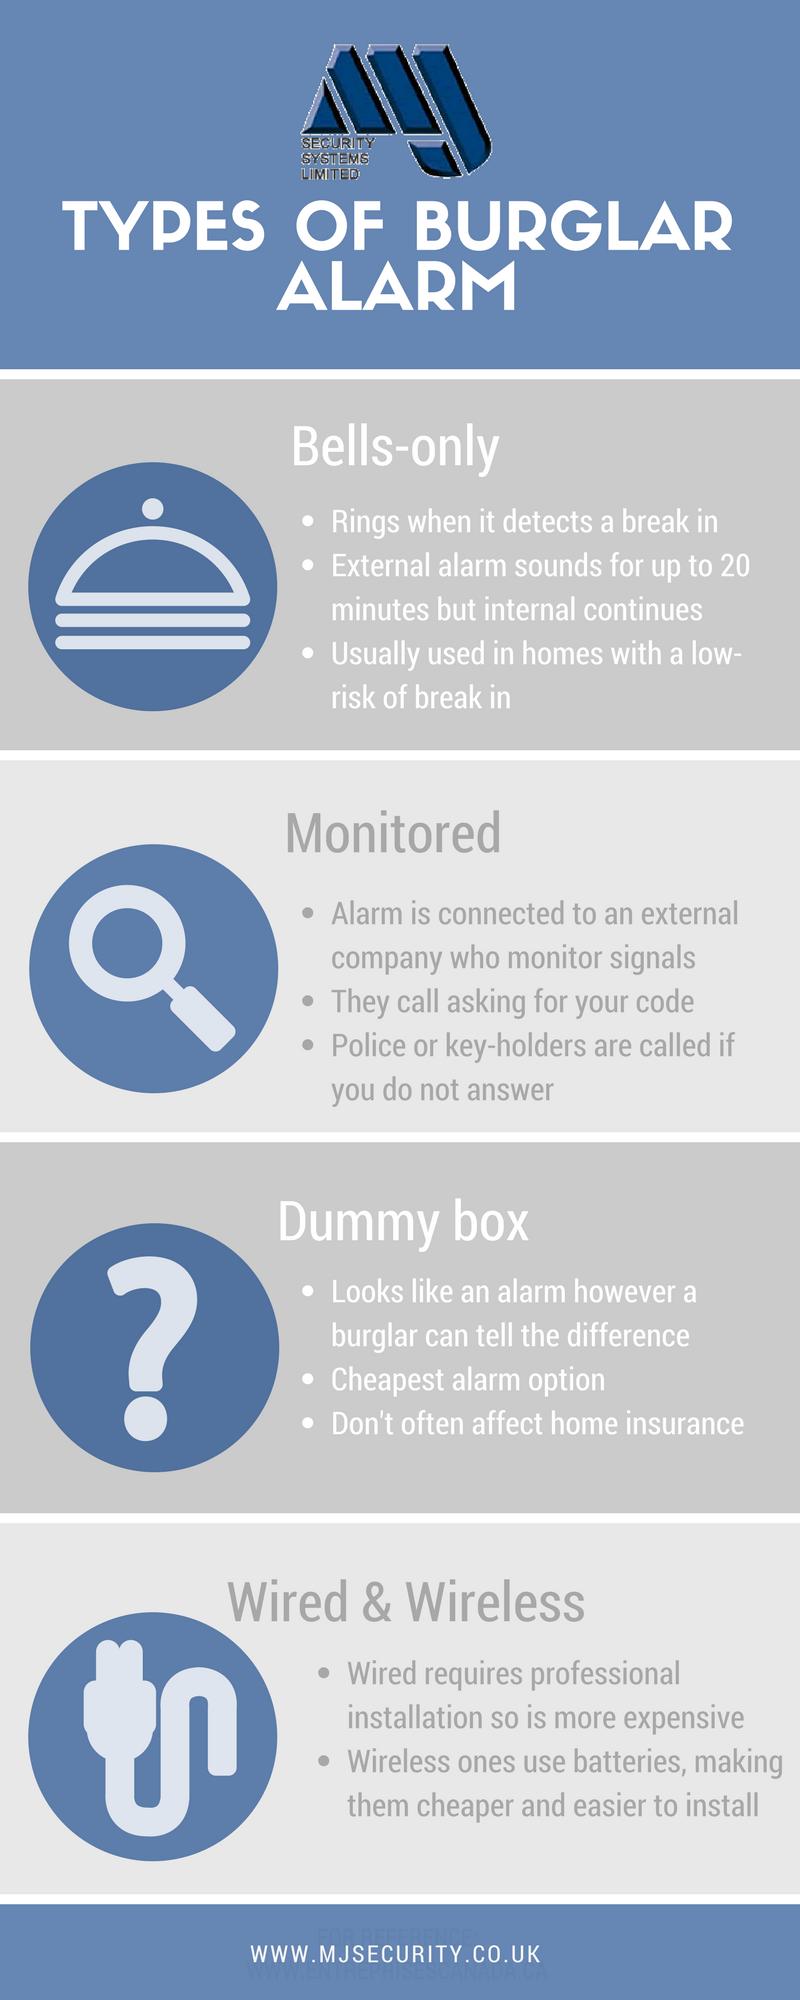 burglar-alarms-types-infographic-lkrllc